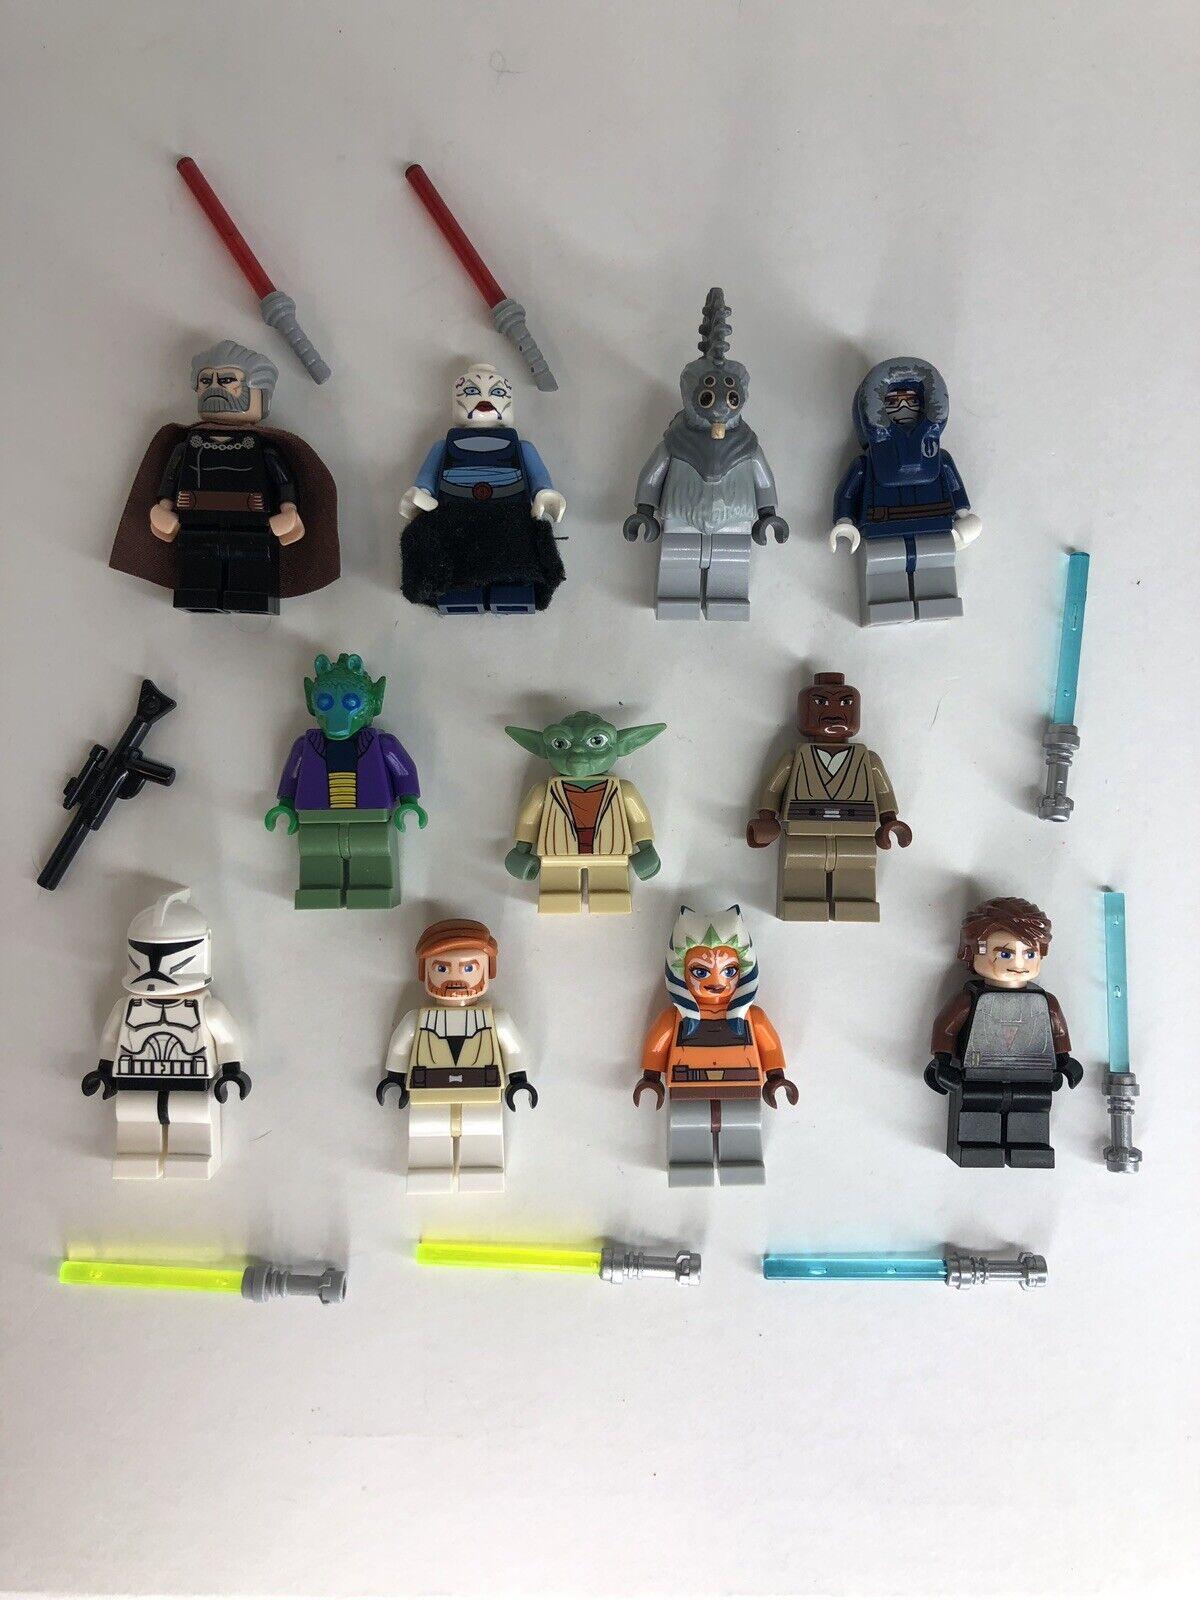 Lego Star Wars Lot 11 Minifigures Windu Count Dooku Asaj Ventress Clone Wars  N9